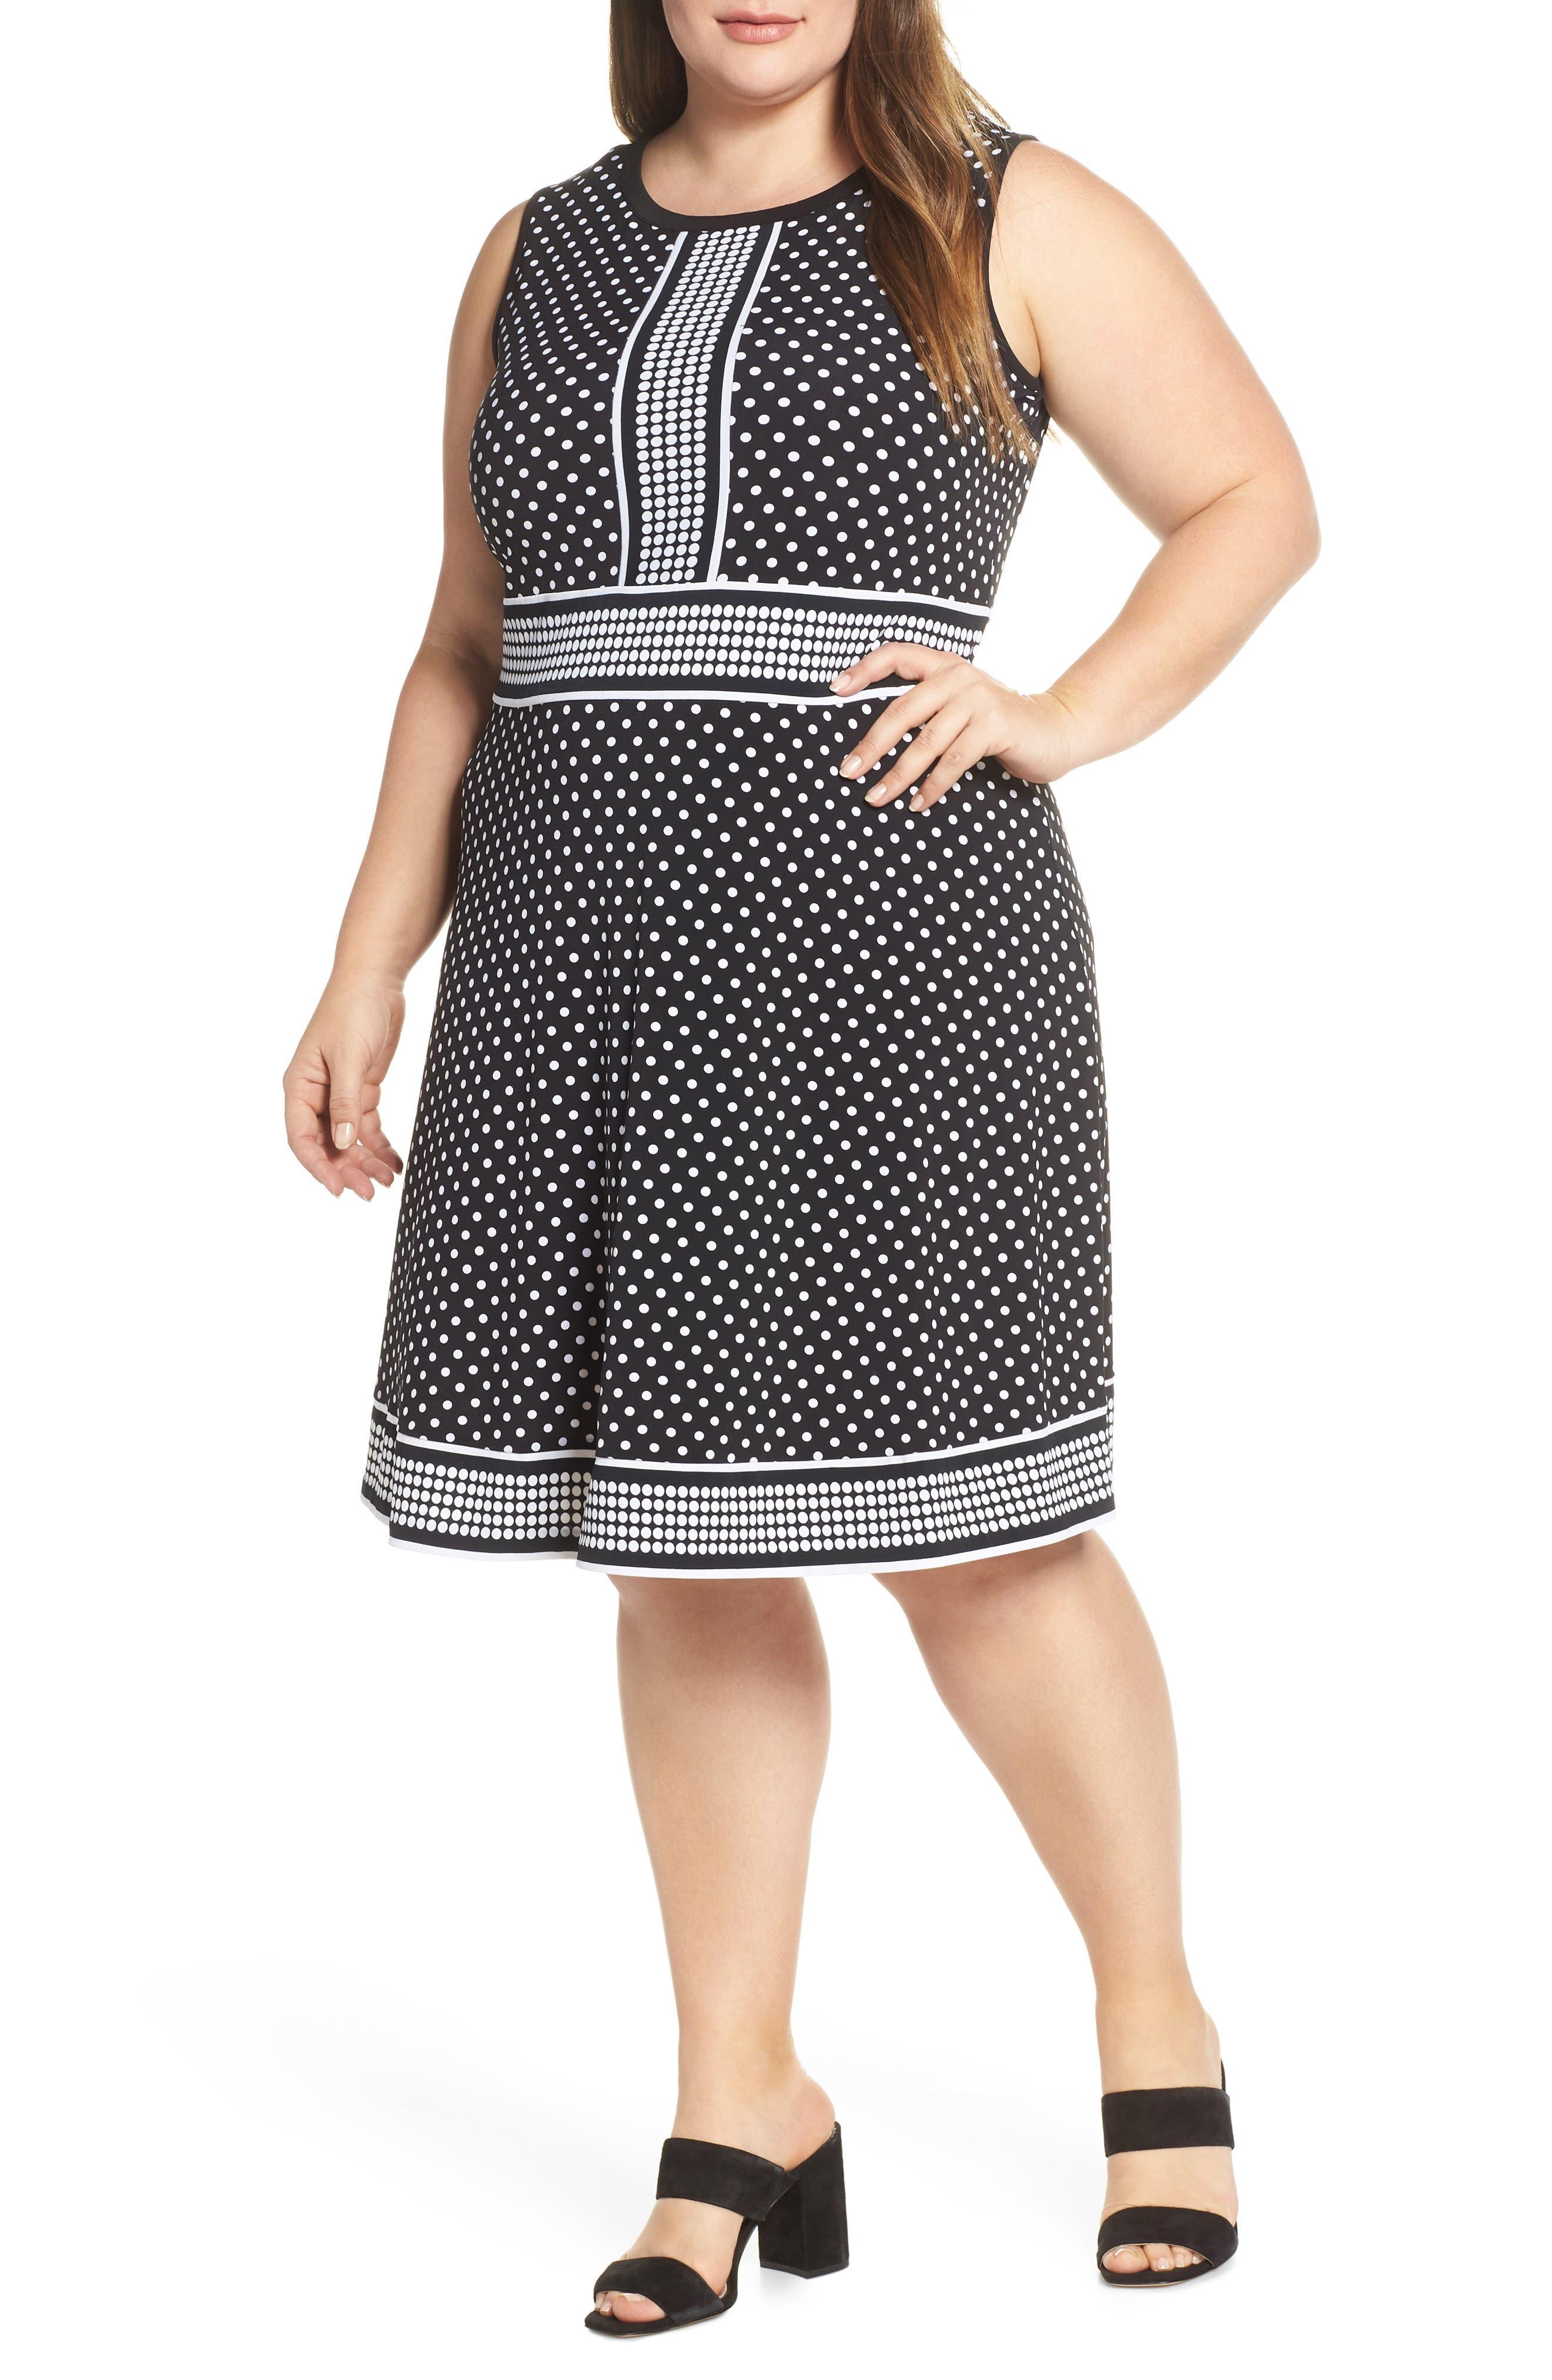 MICHAEL MICHAEL KORS Mixed Polka Dot Dress, Main, color, BLACK/ WHITE